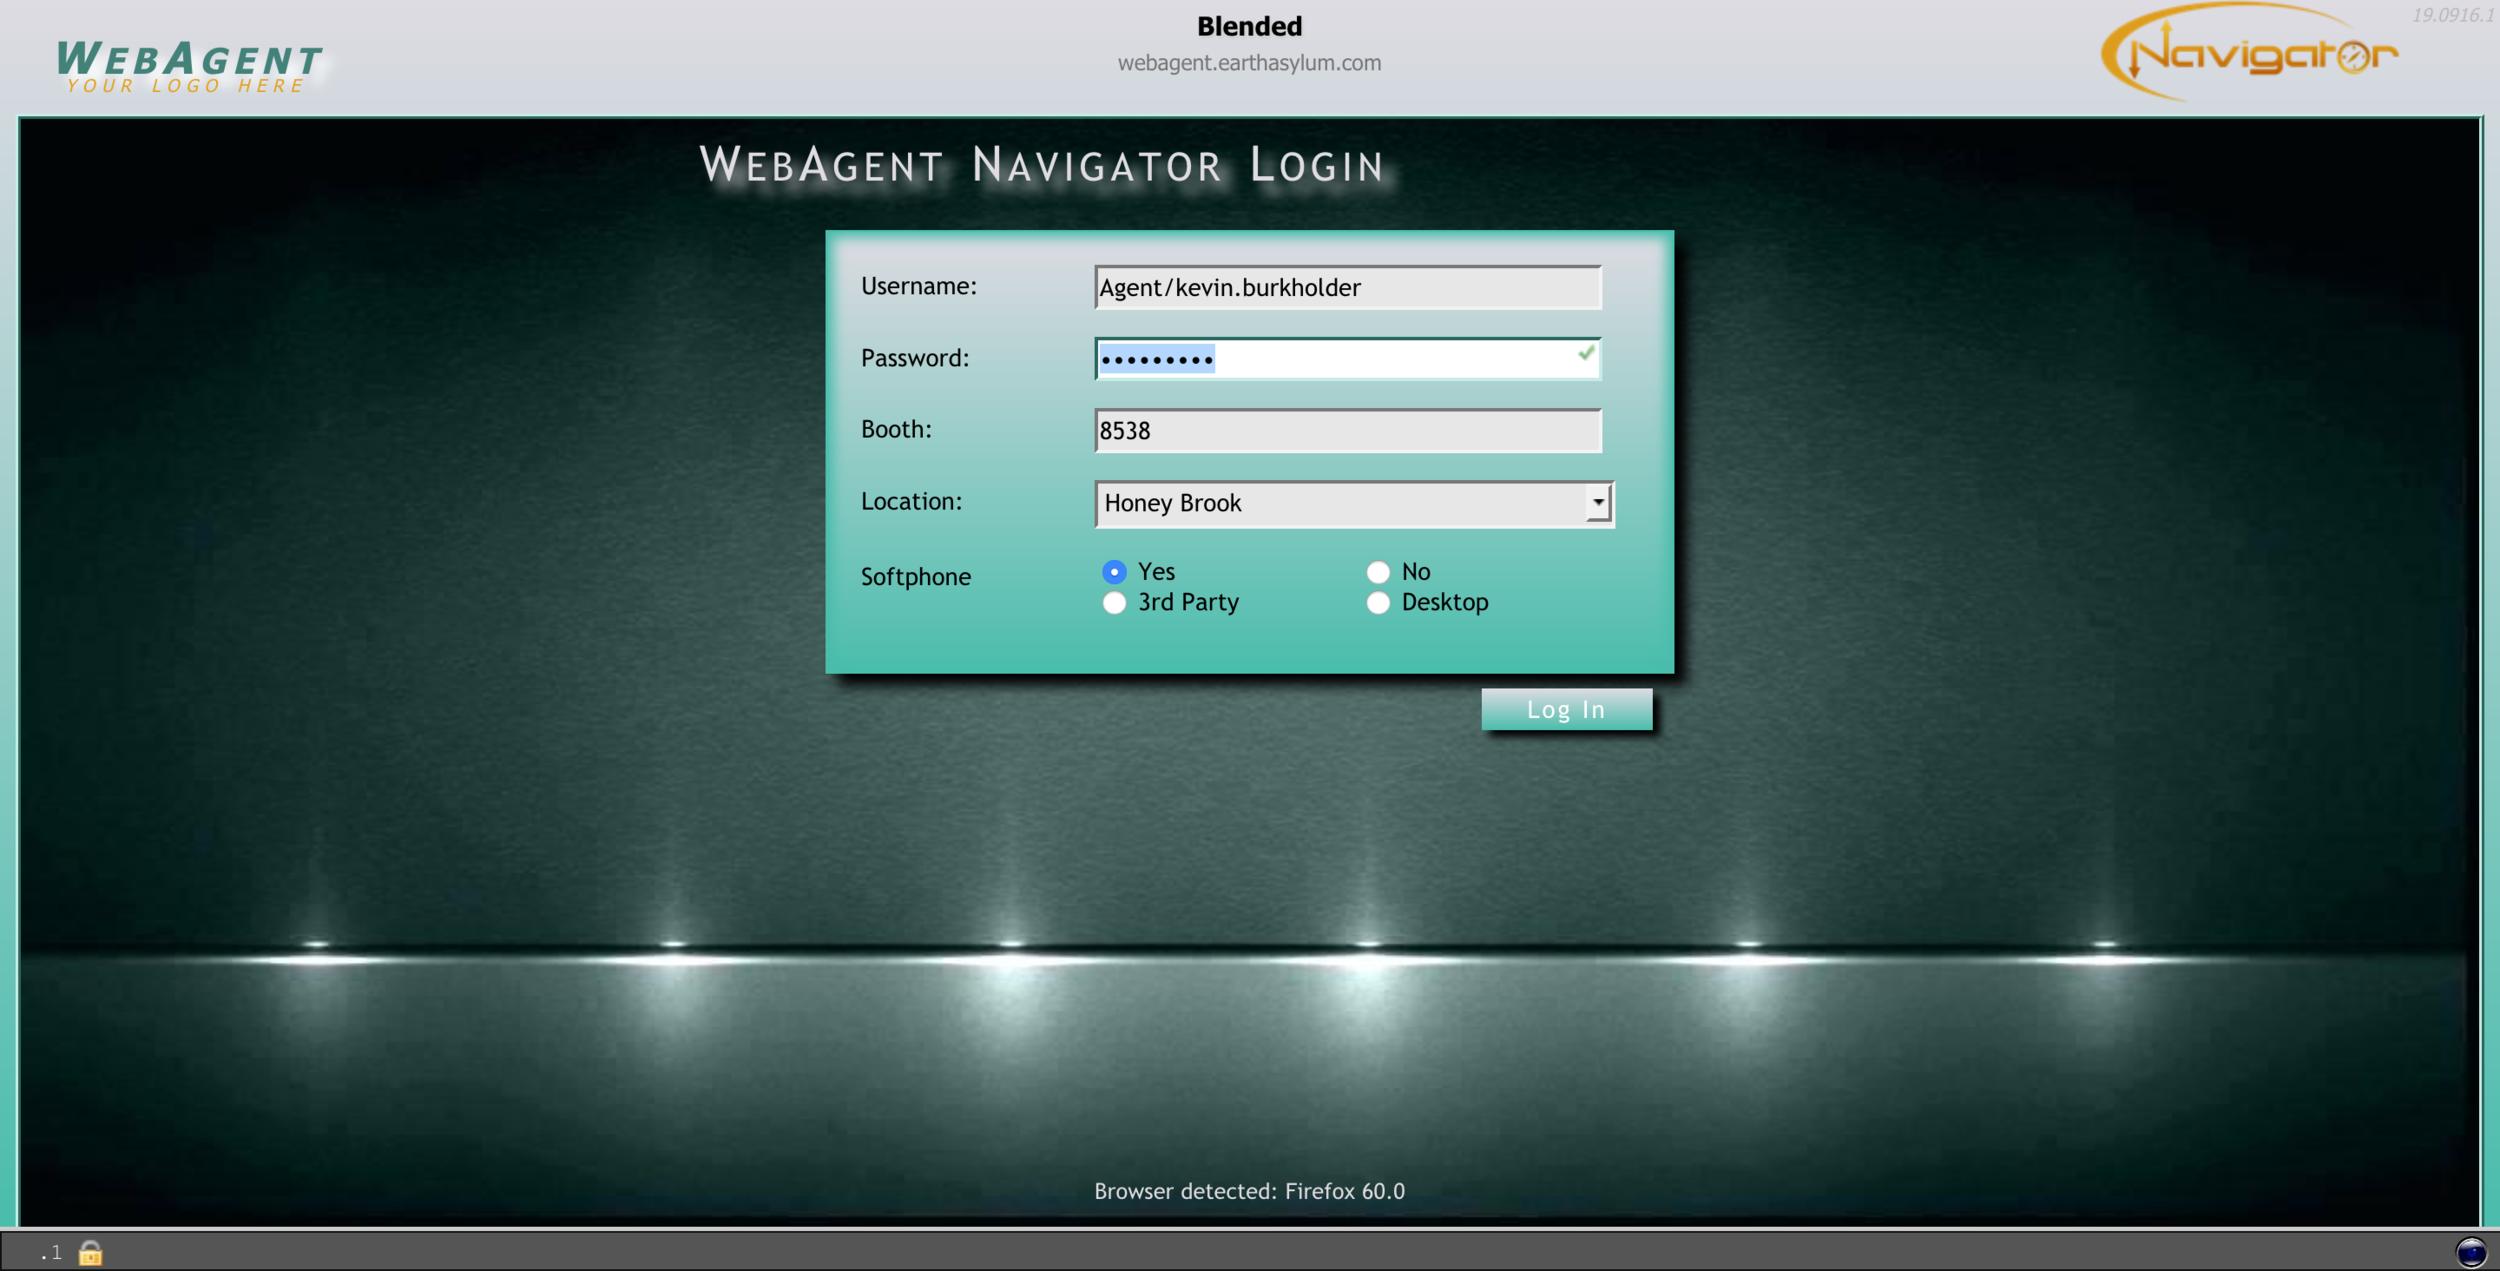 webagent login screen.png